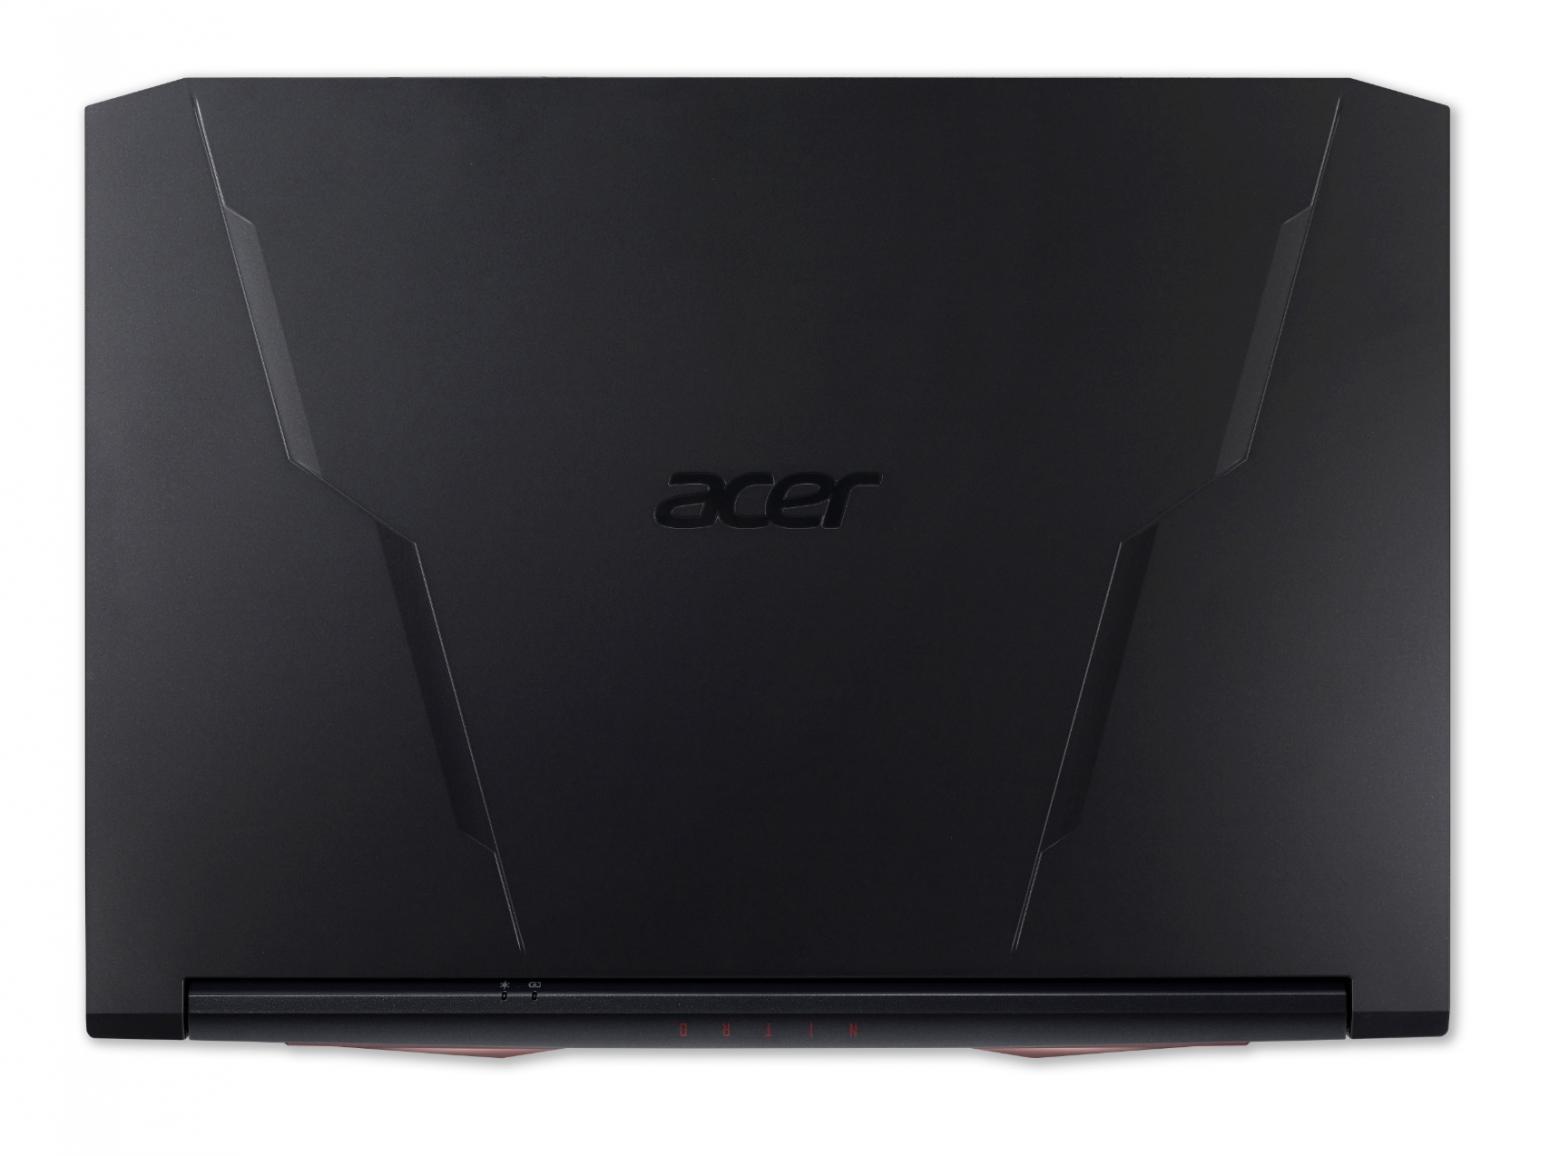 Ordinateur portable Acer Nitro 5 AN515-45-R90U - RTX 3080, 360Hz - photo 5